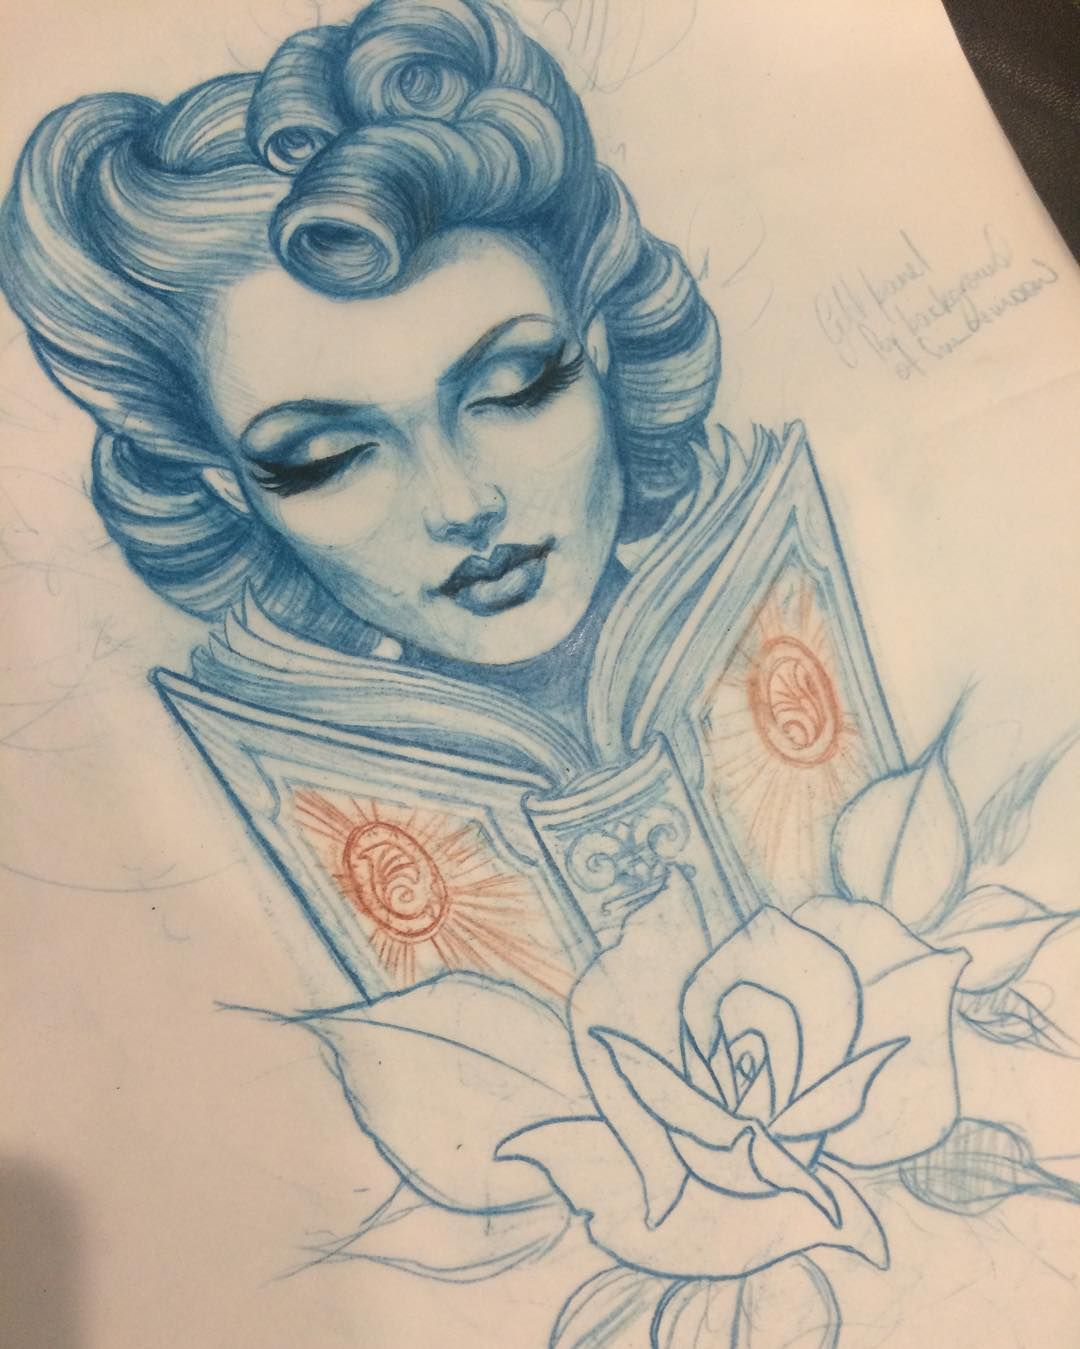 Tattoo design by teniele sadd traditional tattoo face traditional tattoo sketches traditional tattoo design